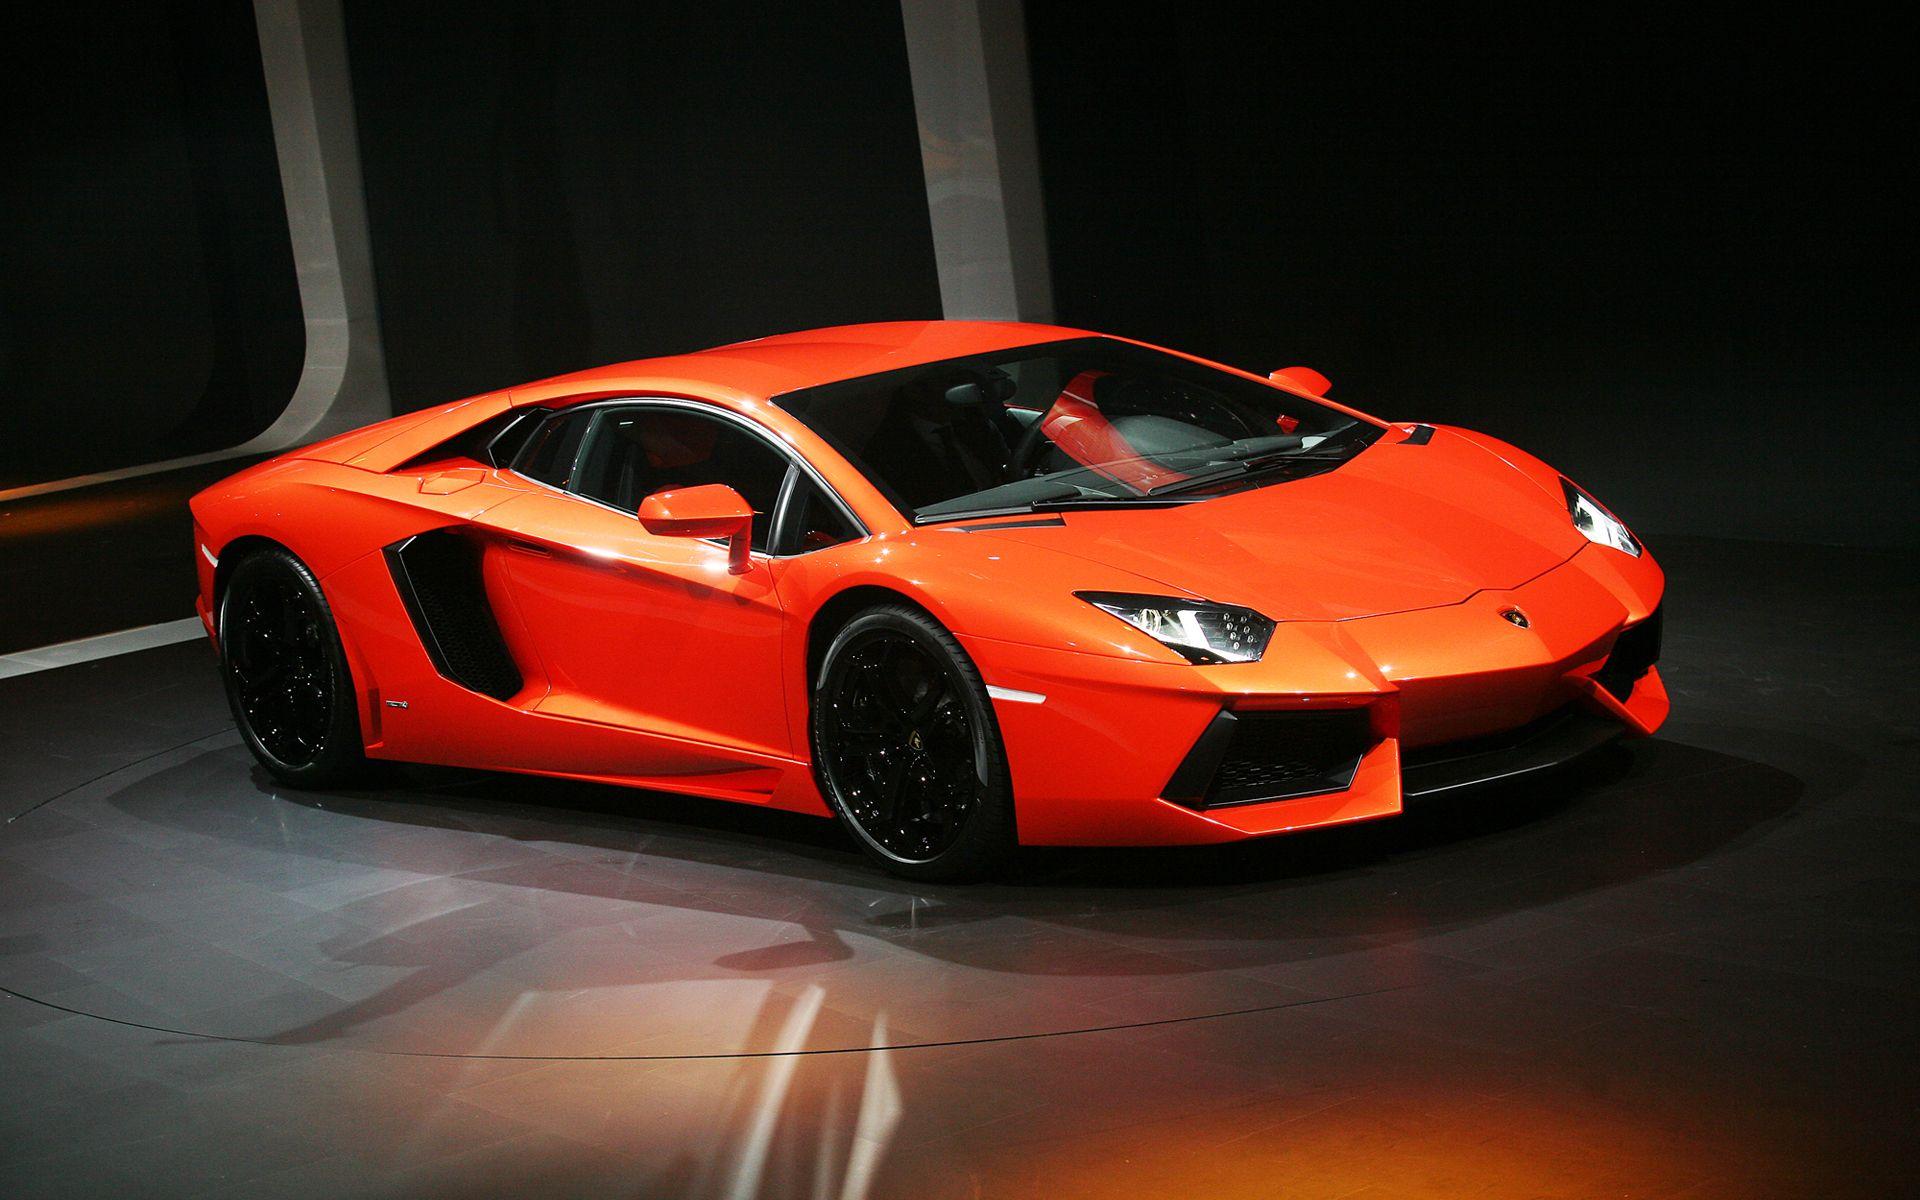 17 terbaik ide tentang lamborghini aventador wallpaper di pinterest lamborghini mobil impian dan mobil keren - Tron Lamborghini Aventador Wallpaper